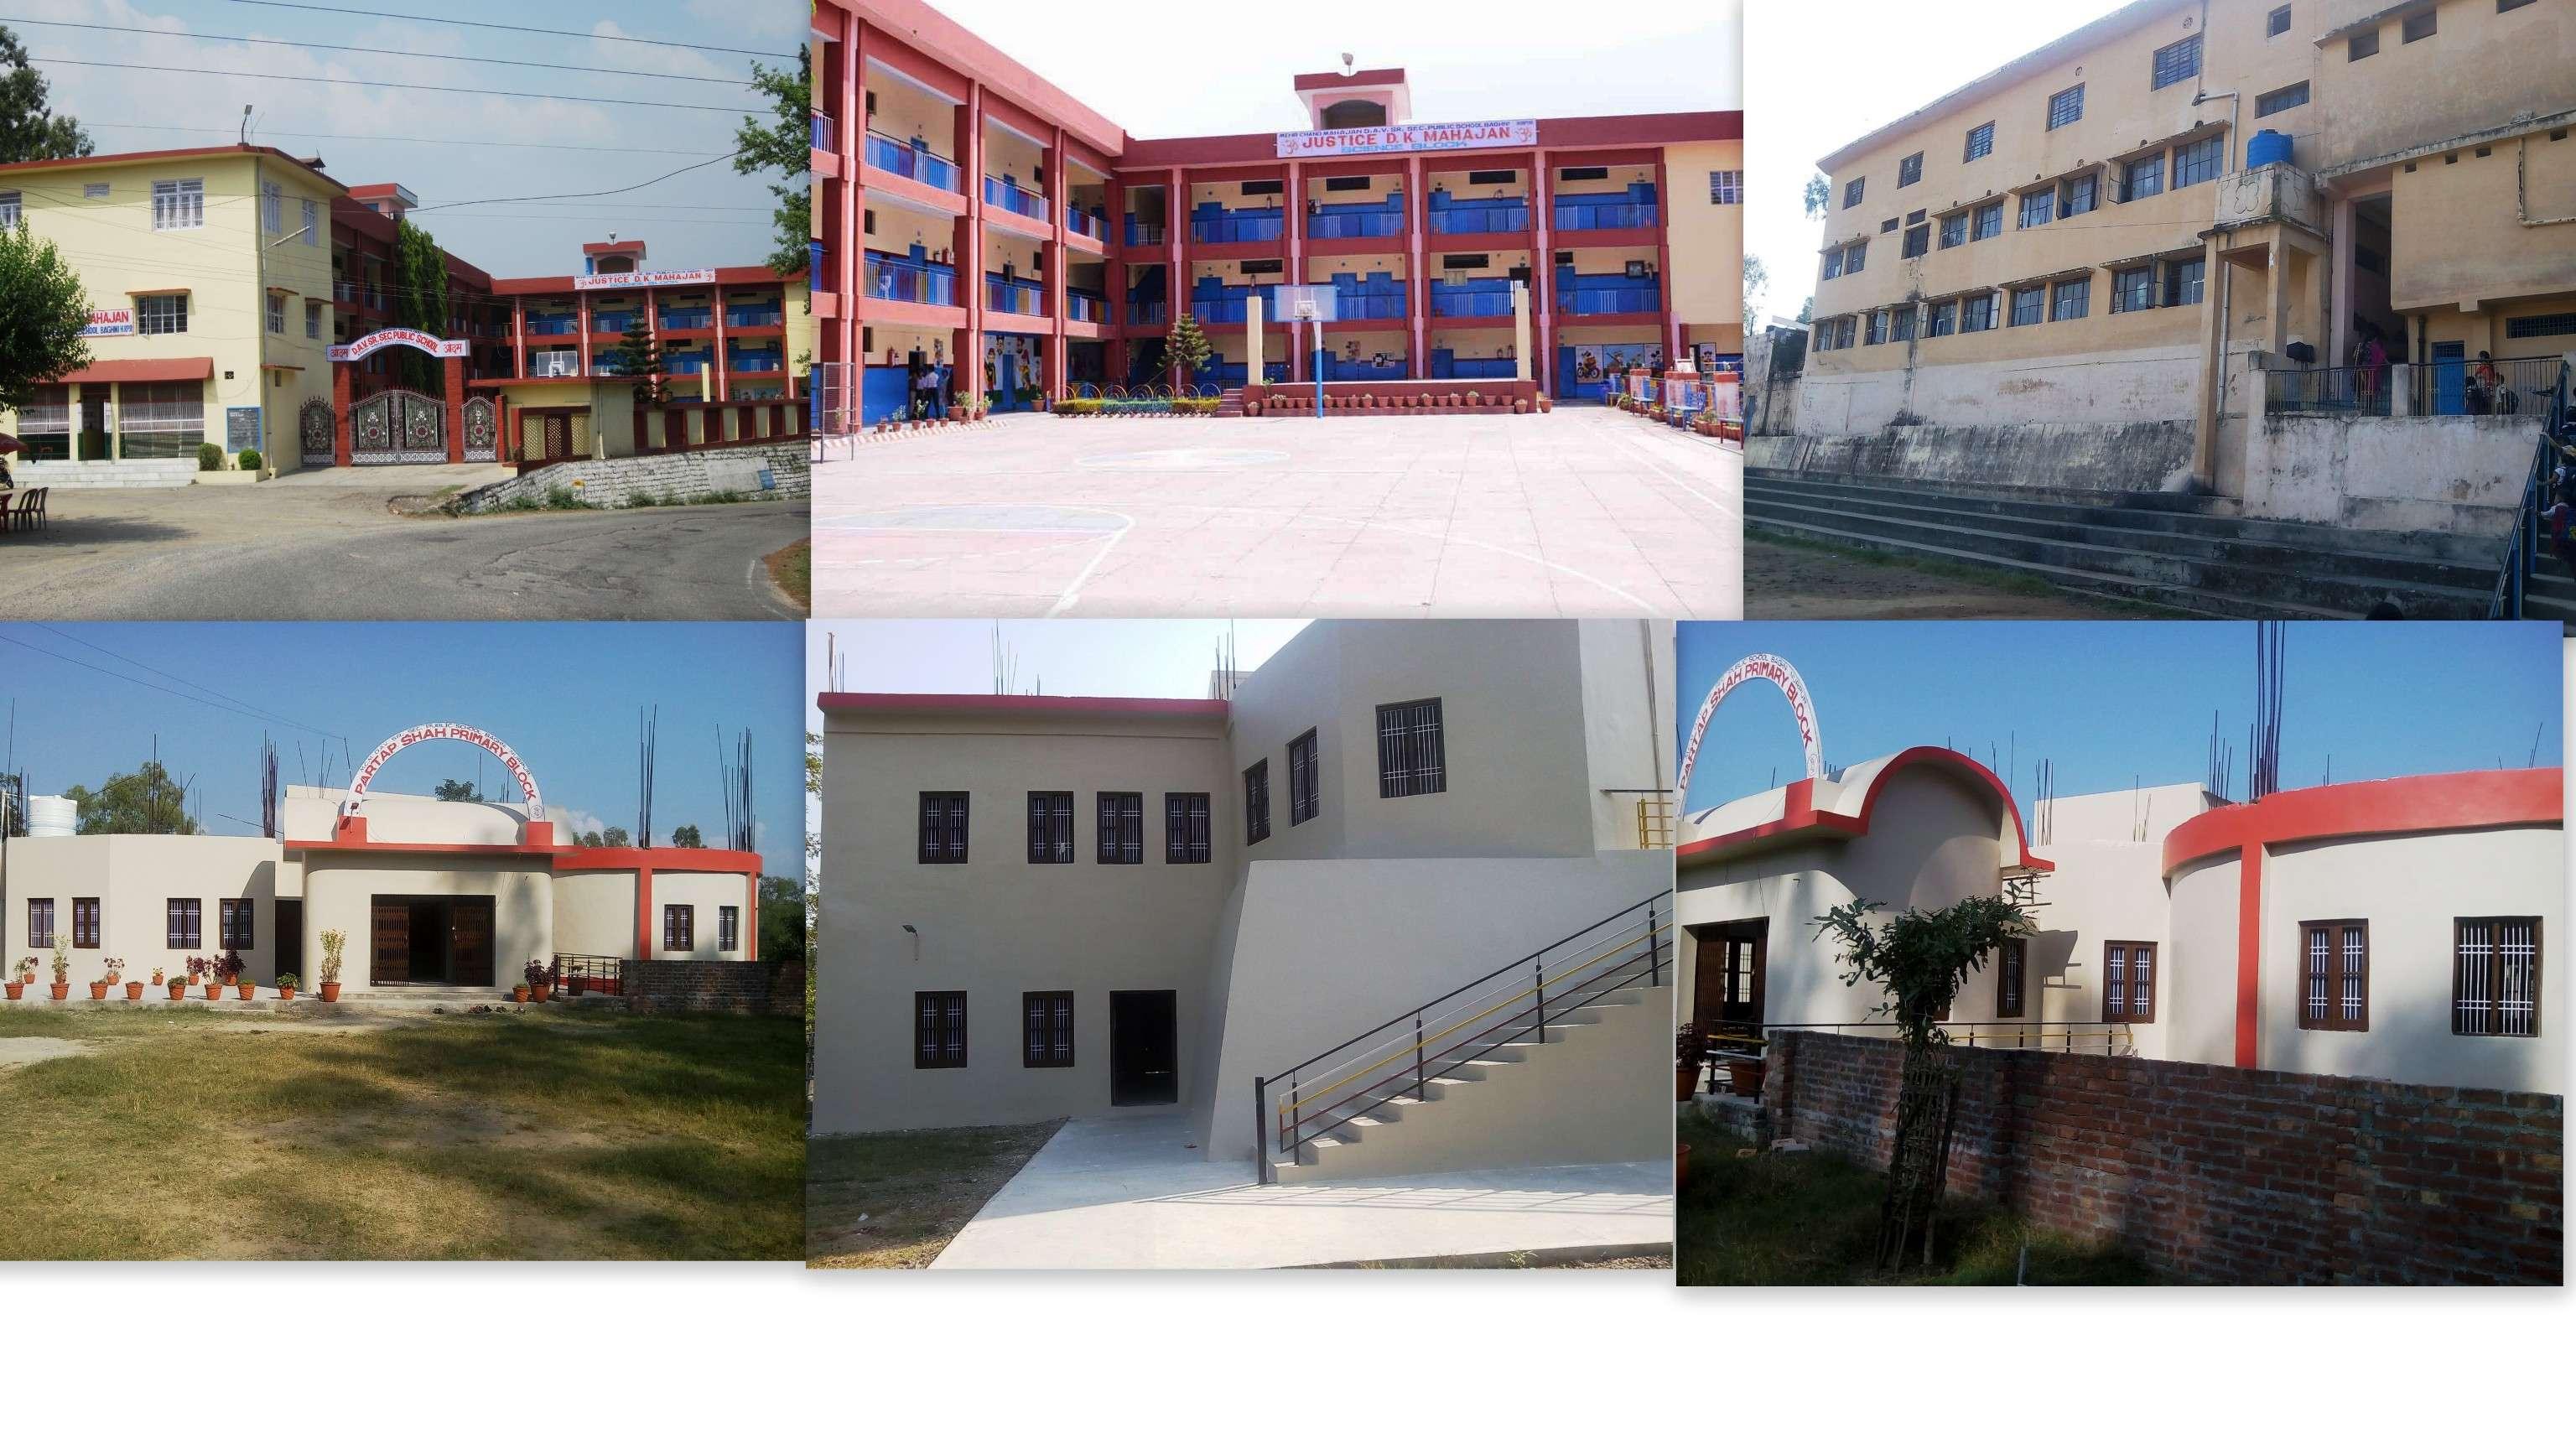 MEHR CHAND MAHAJAN D A V SR SEC PUBLIC SCHOOL BAGHNI NURPUR DISTT KANGRA HIMACHAL PRADESH 630035